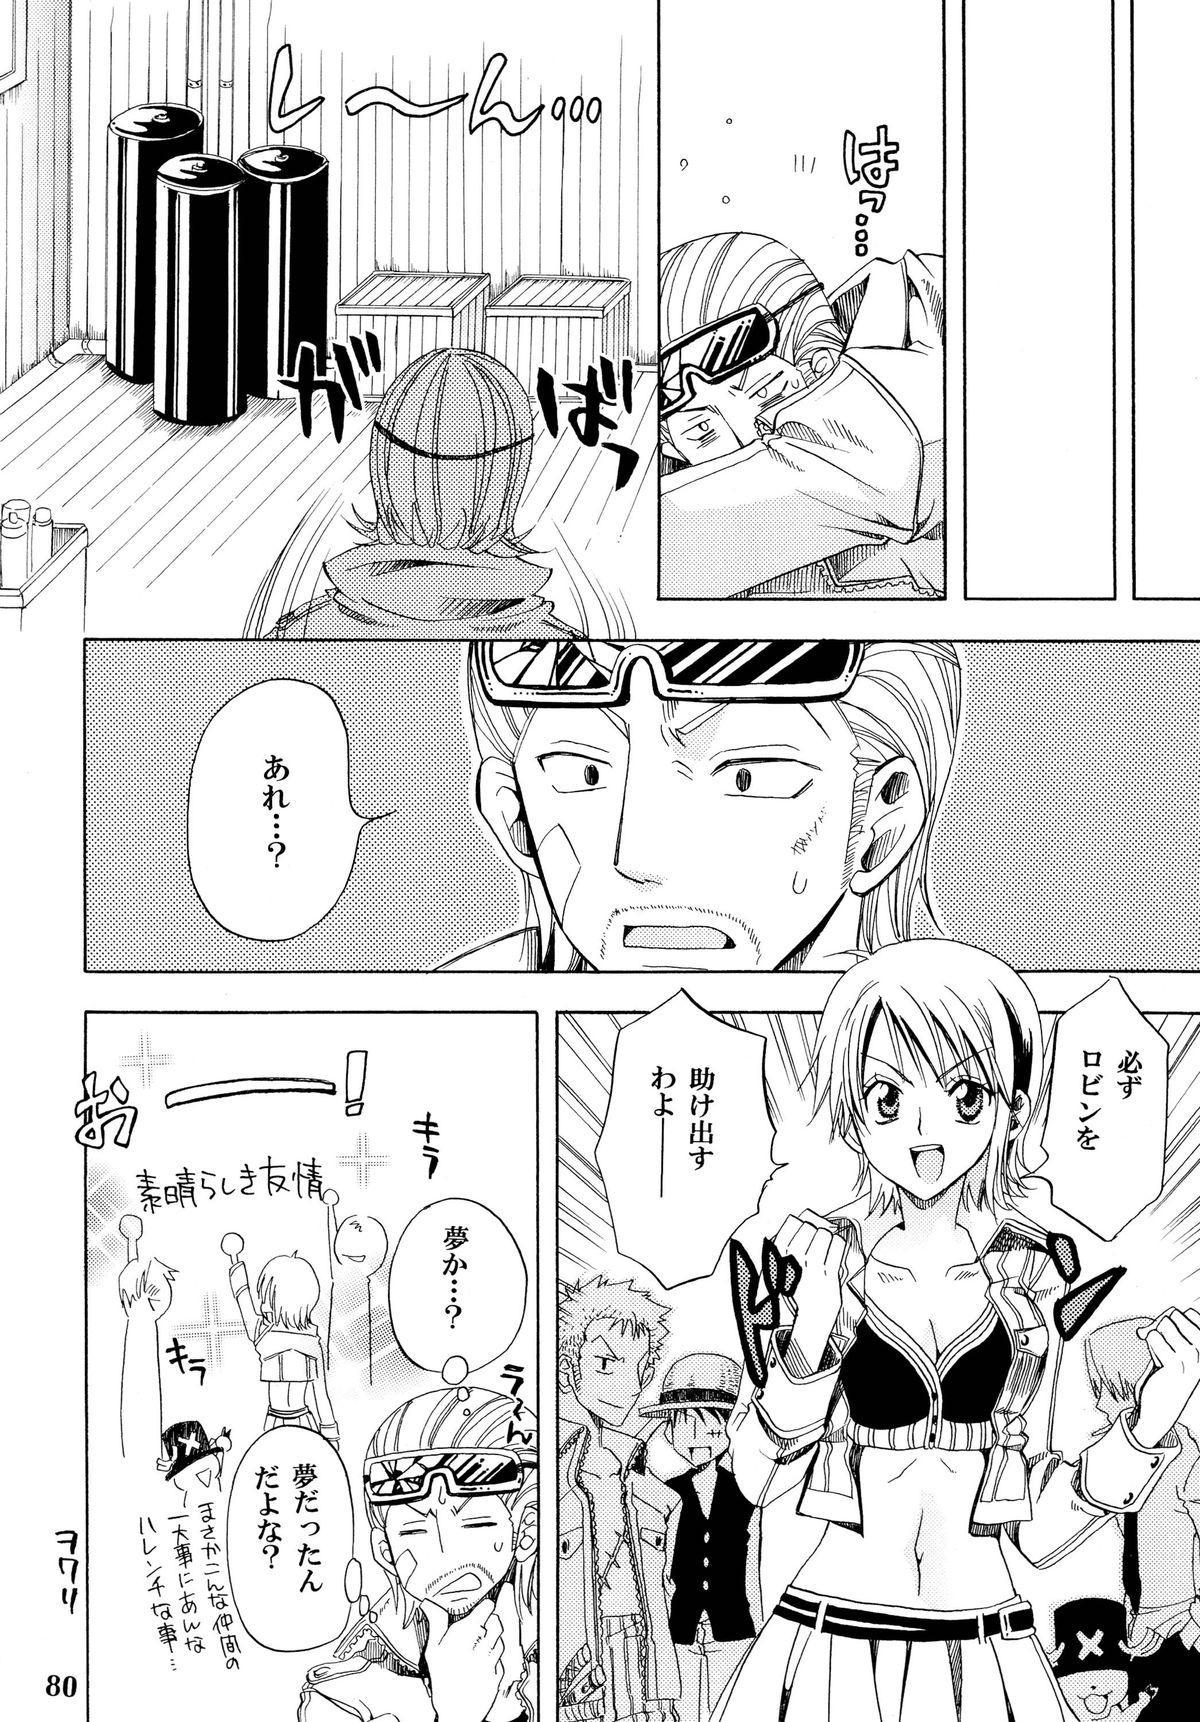 Zoro-Nami ★ Sairoku 79